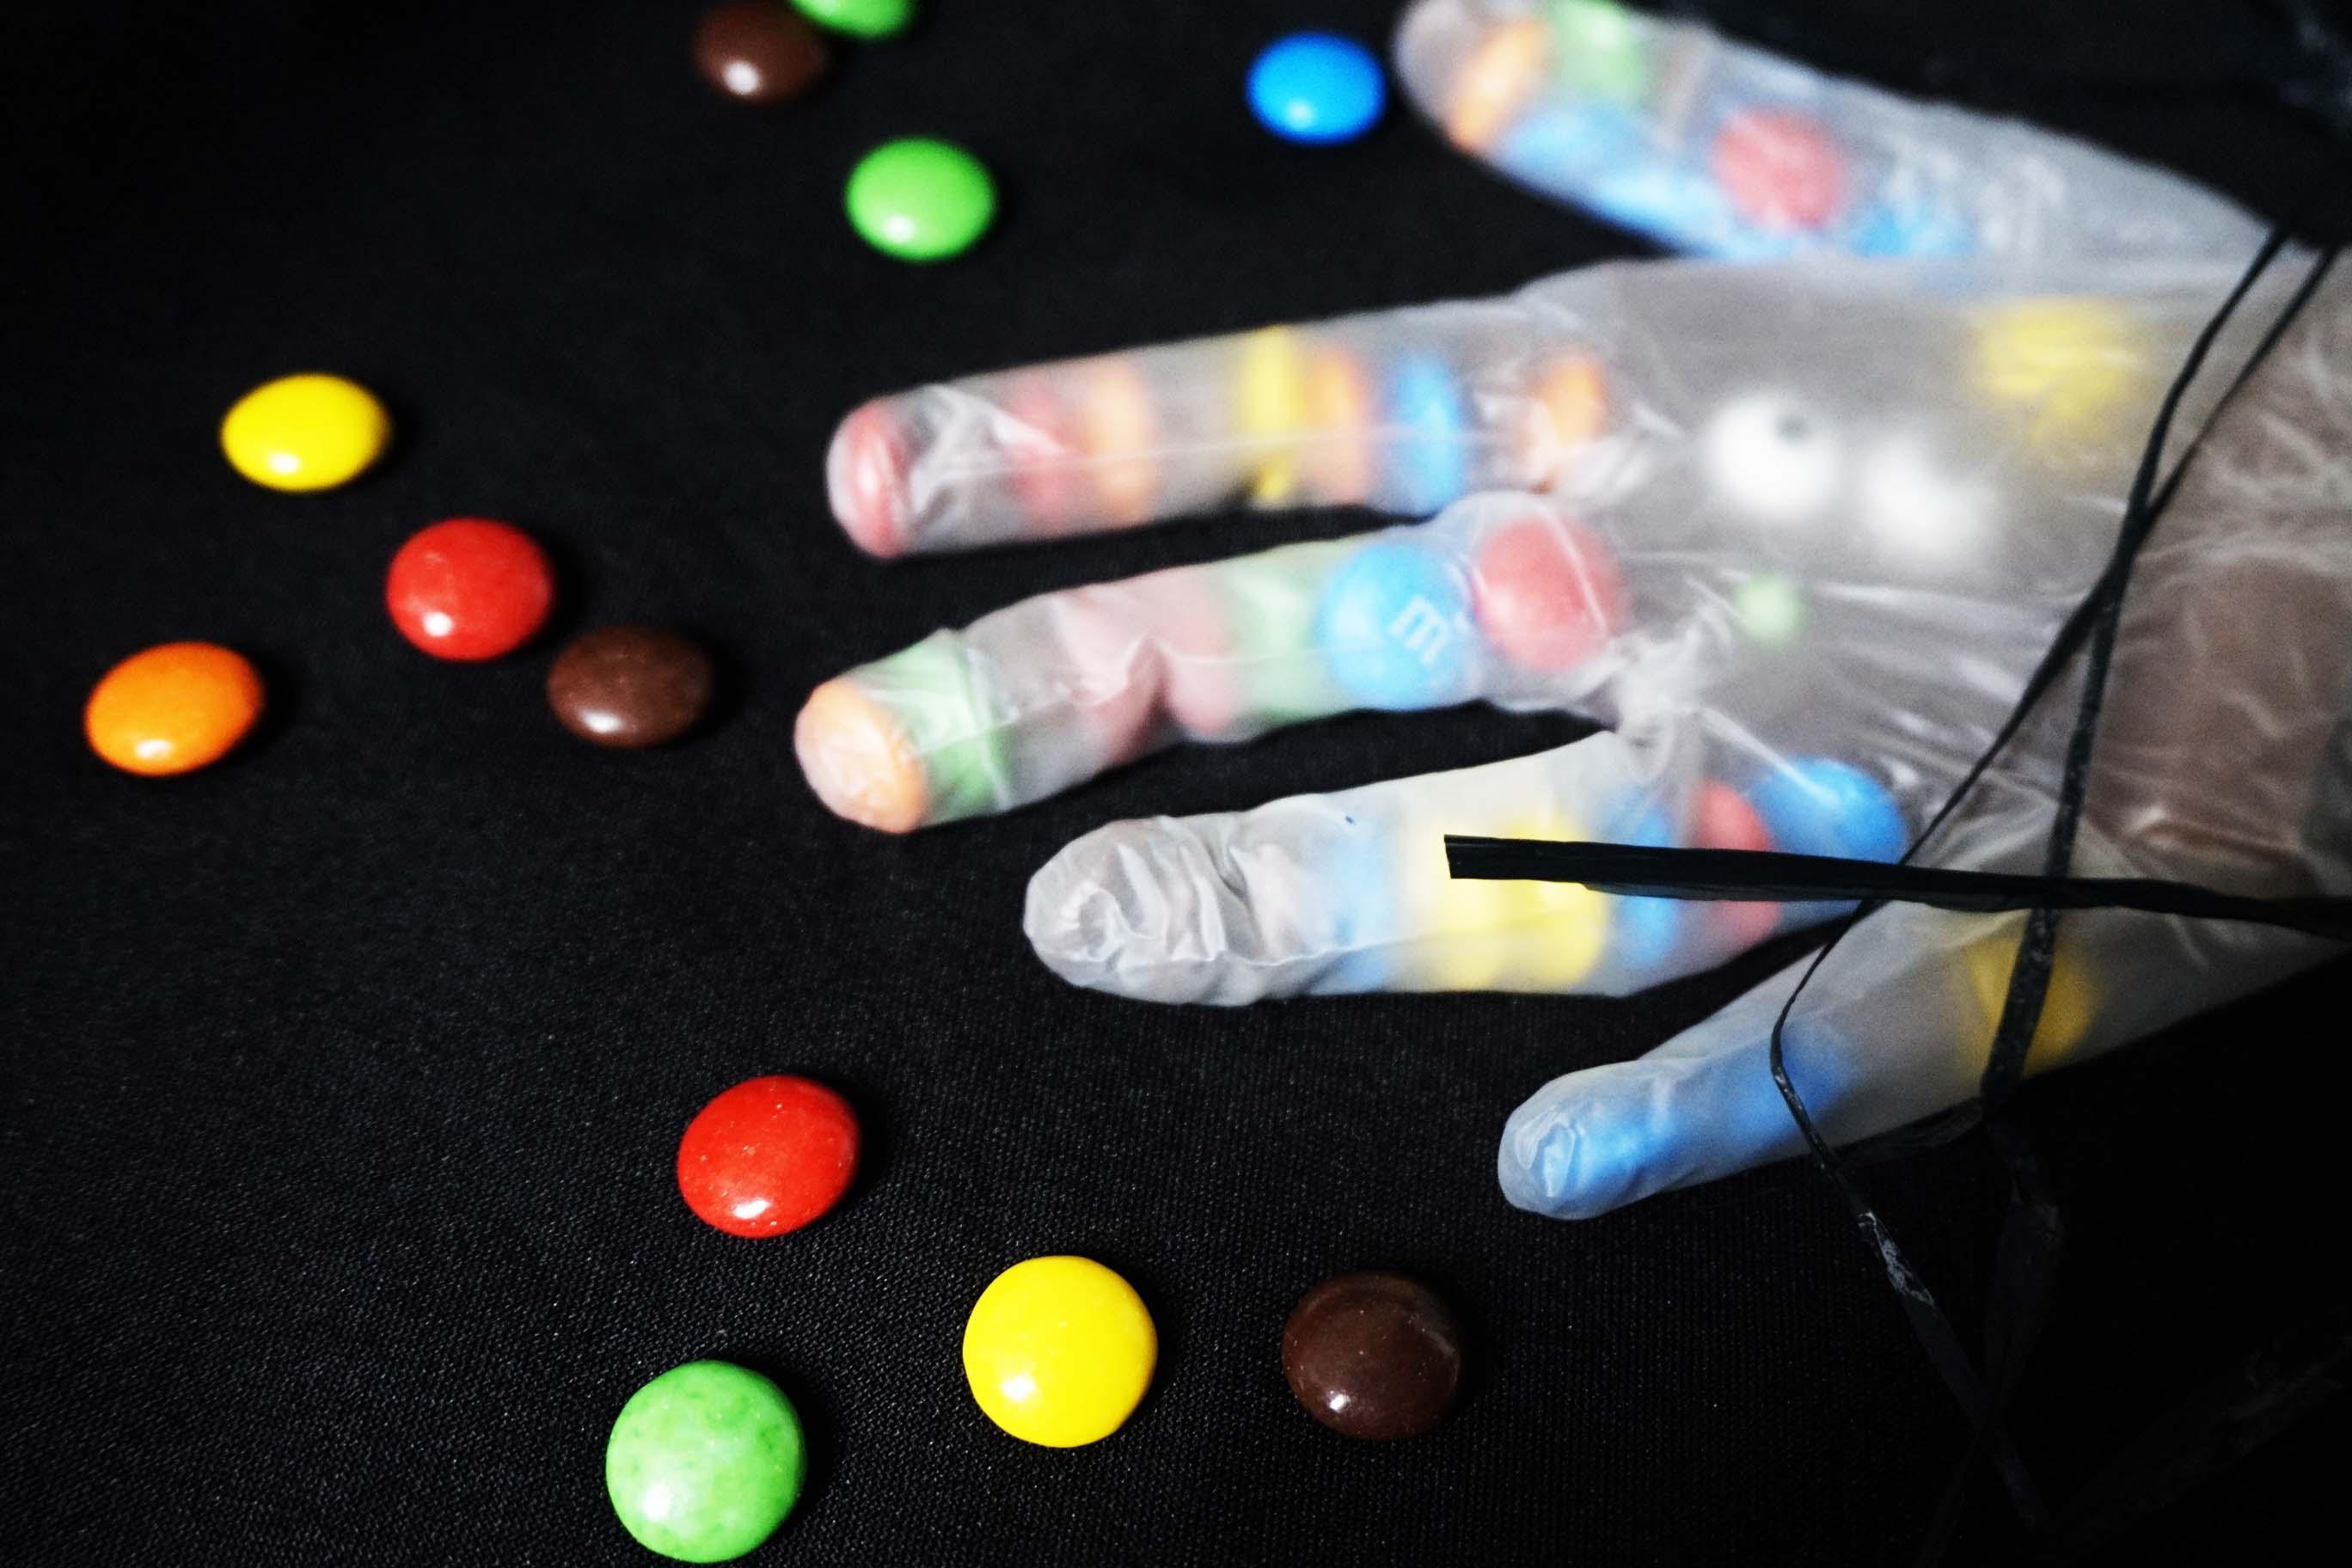 Halloween, Geschenke, Grusel, Trick or treat, Süßigkeiten, Süßes, Schokolade, DIY, Di it yourself, Kochen, Backen, Idee, KReativ, Basteln, Gruselig, Horror,